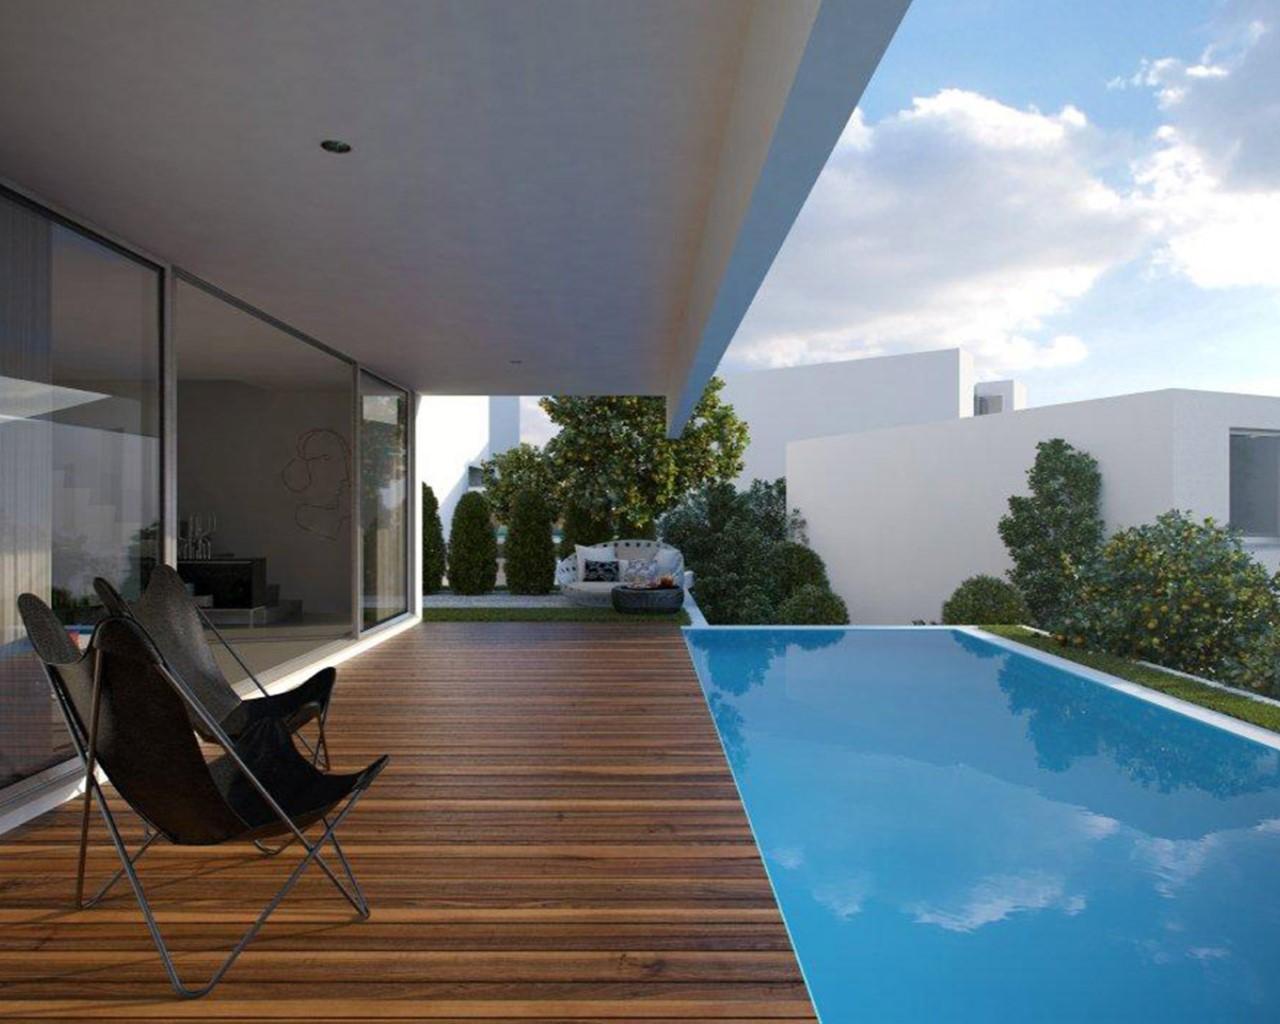 Pool configuration